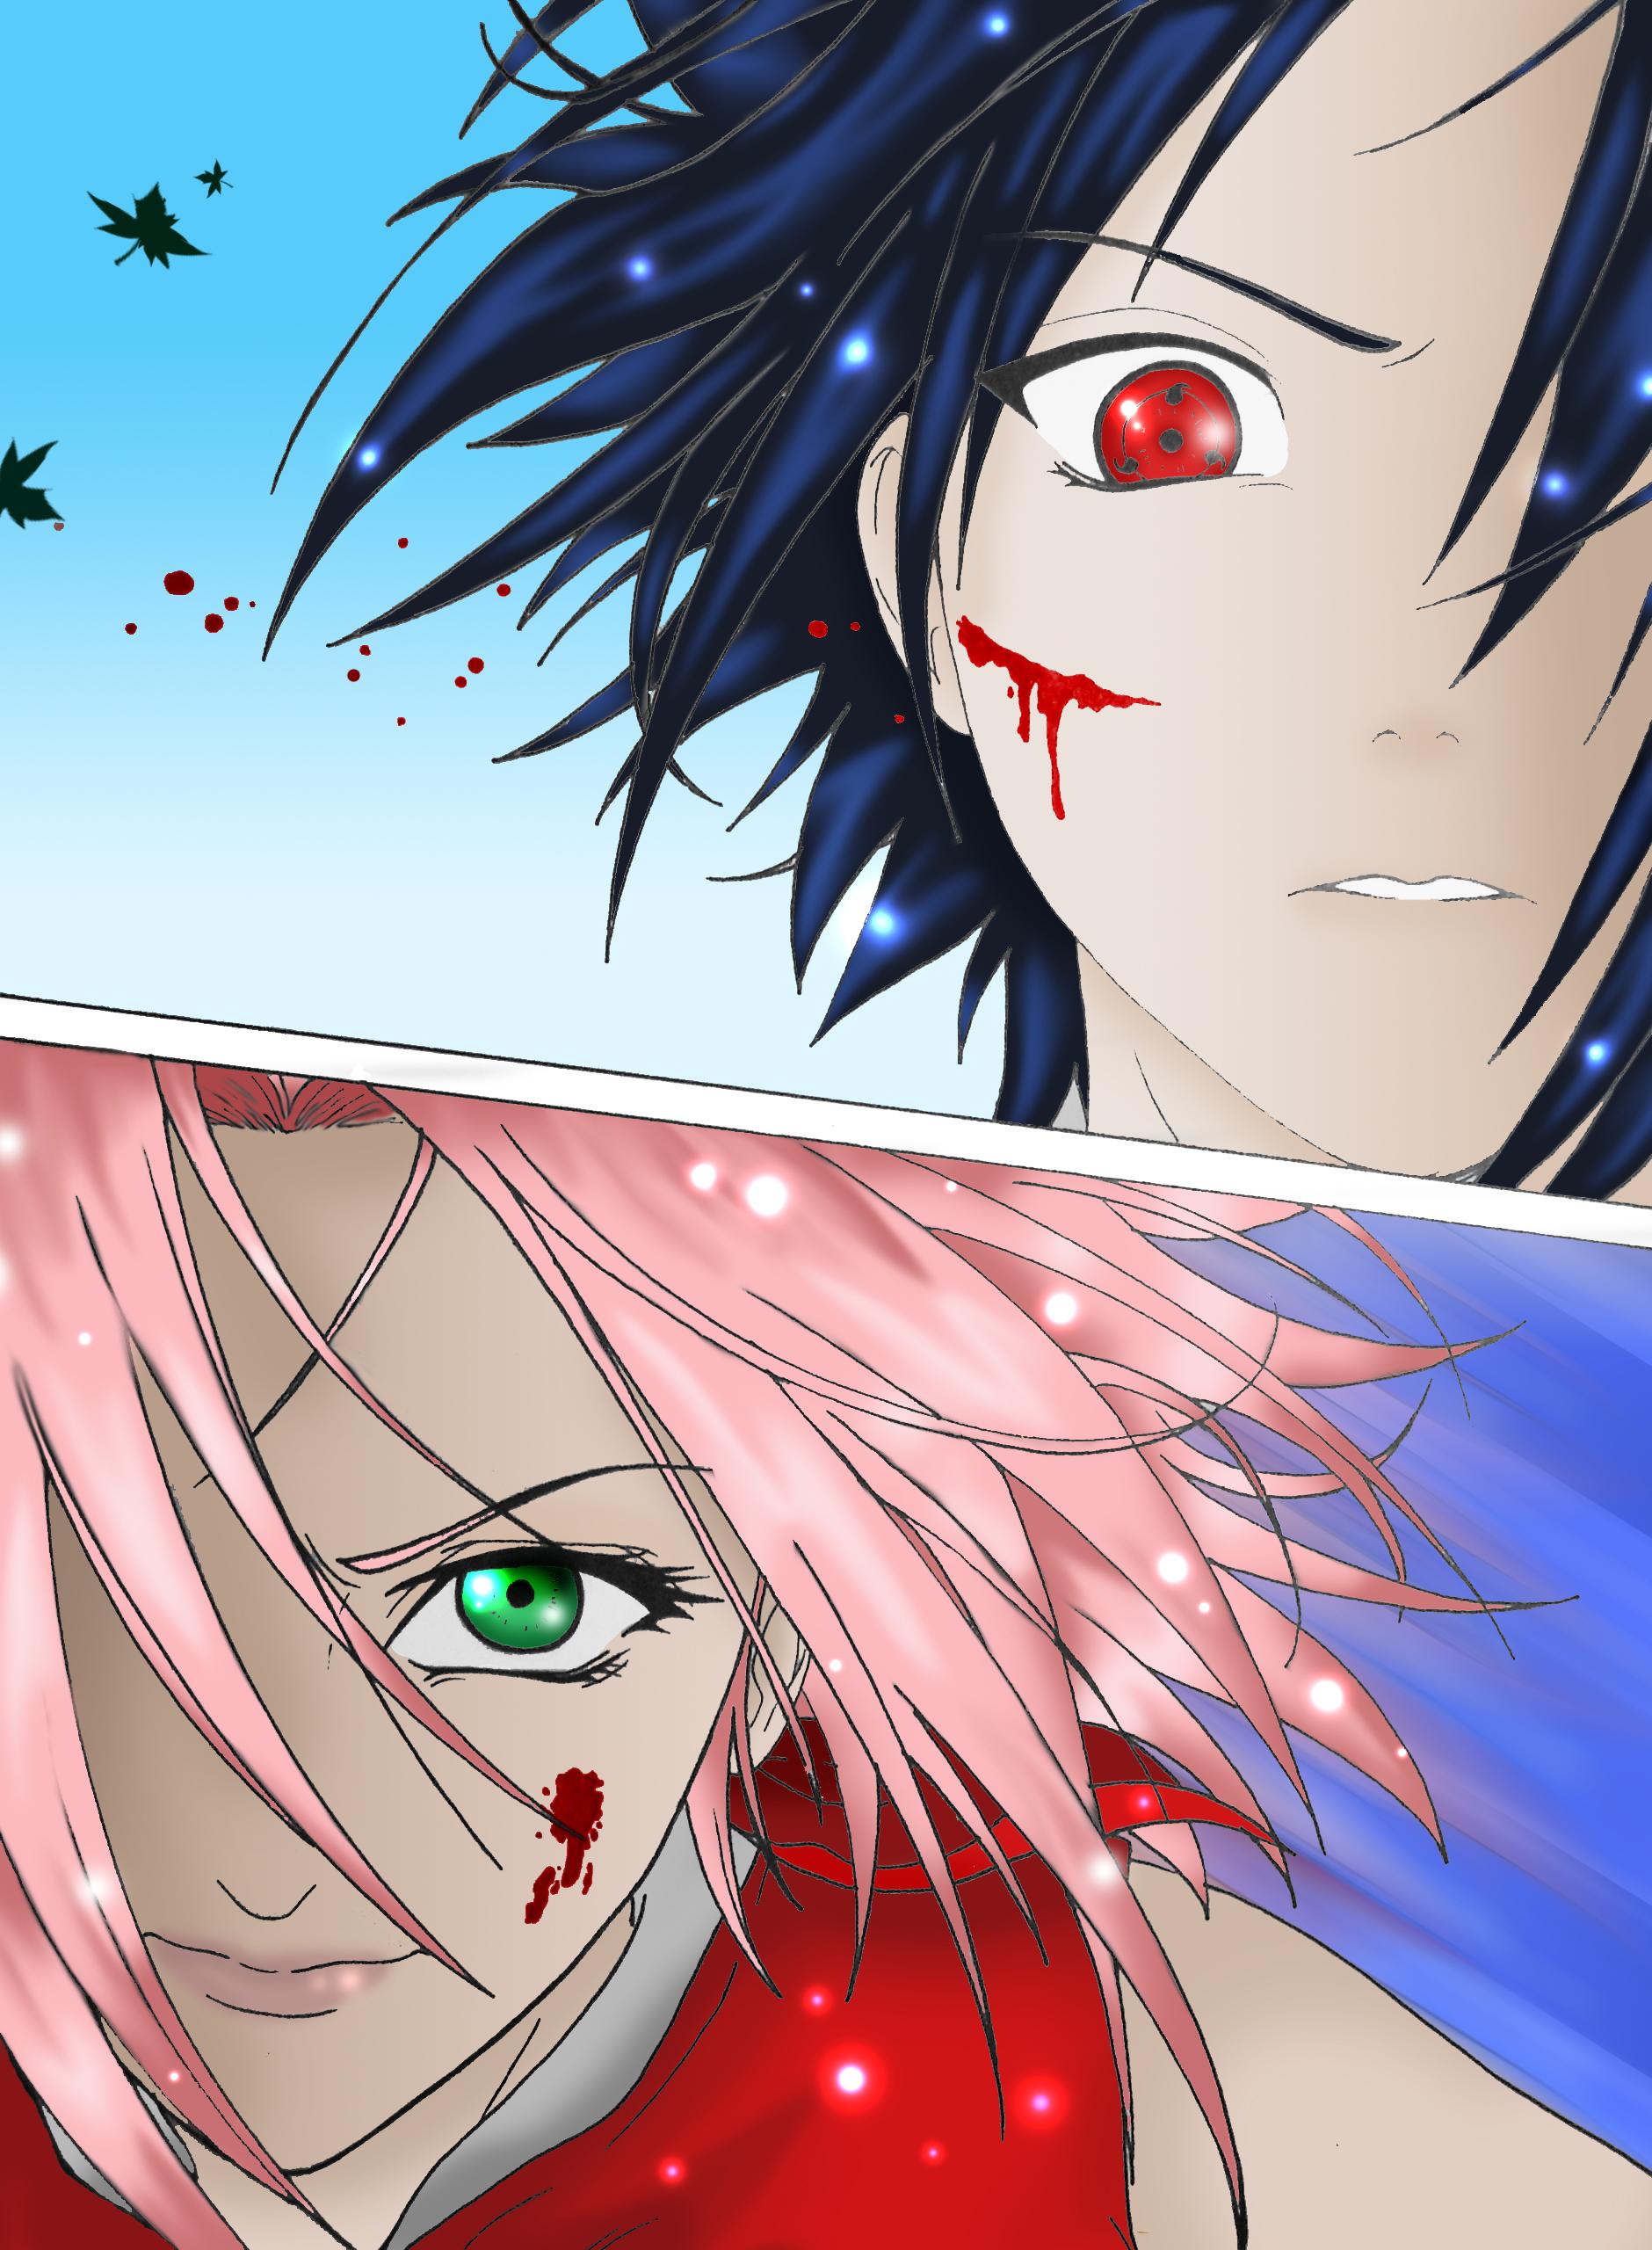 http://fc80.deviantart.com/fs26/f/2008/040/7/b/Sakura_vs_Sasuke_by_MuzzaThePerv.jpg